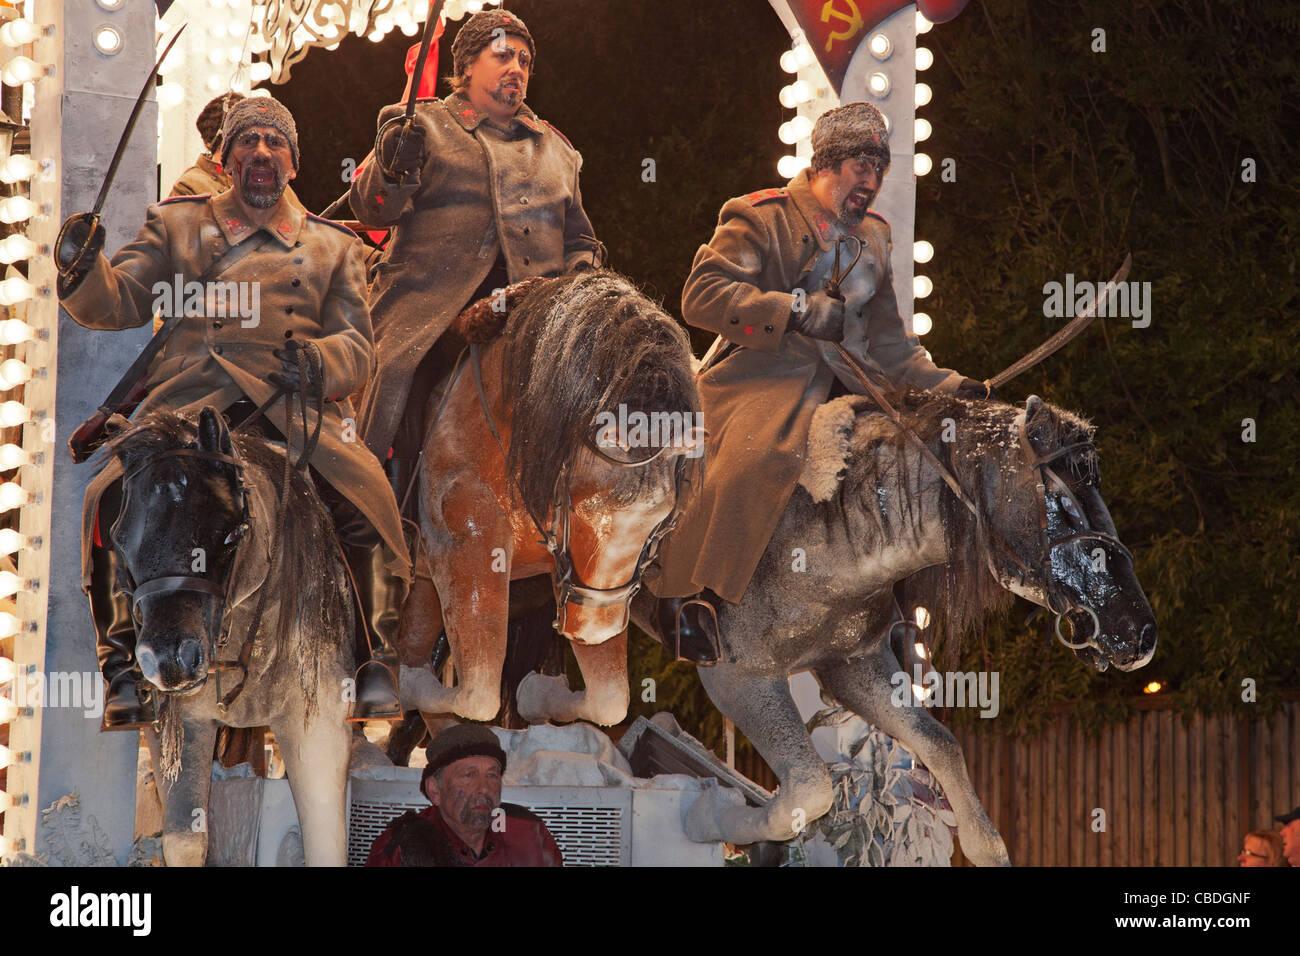 Closeup of Overthrow of the Tsar Portrait by Pentathlon Carnival Club. - Stock Image